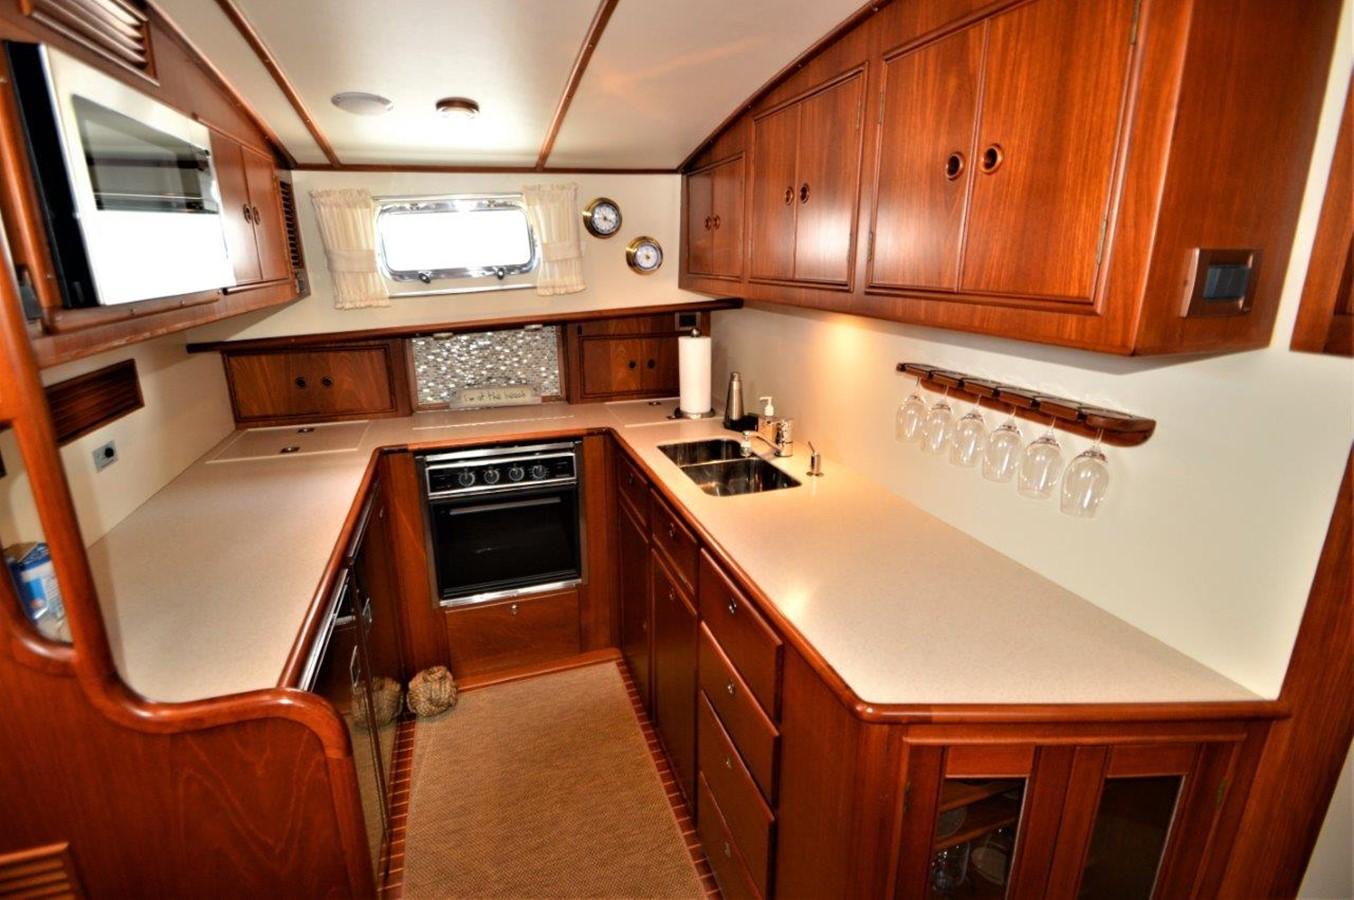 2000 GRAND BANKS 49 Eastbay HX Cruiser 2669756